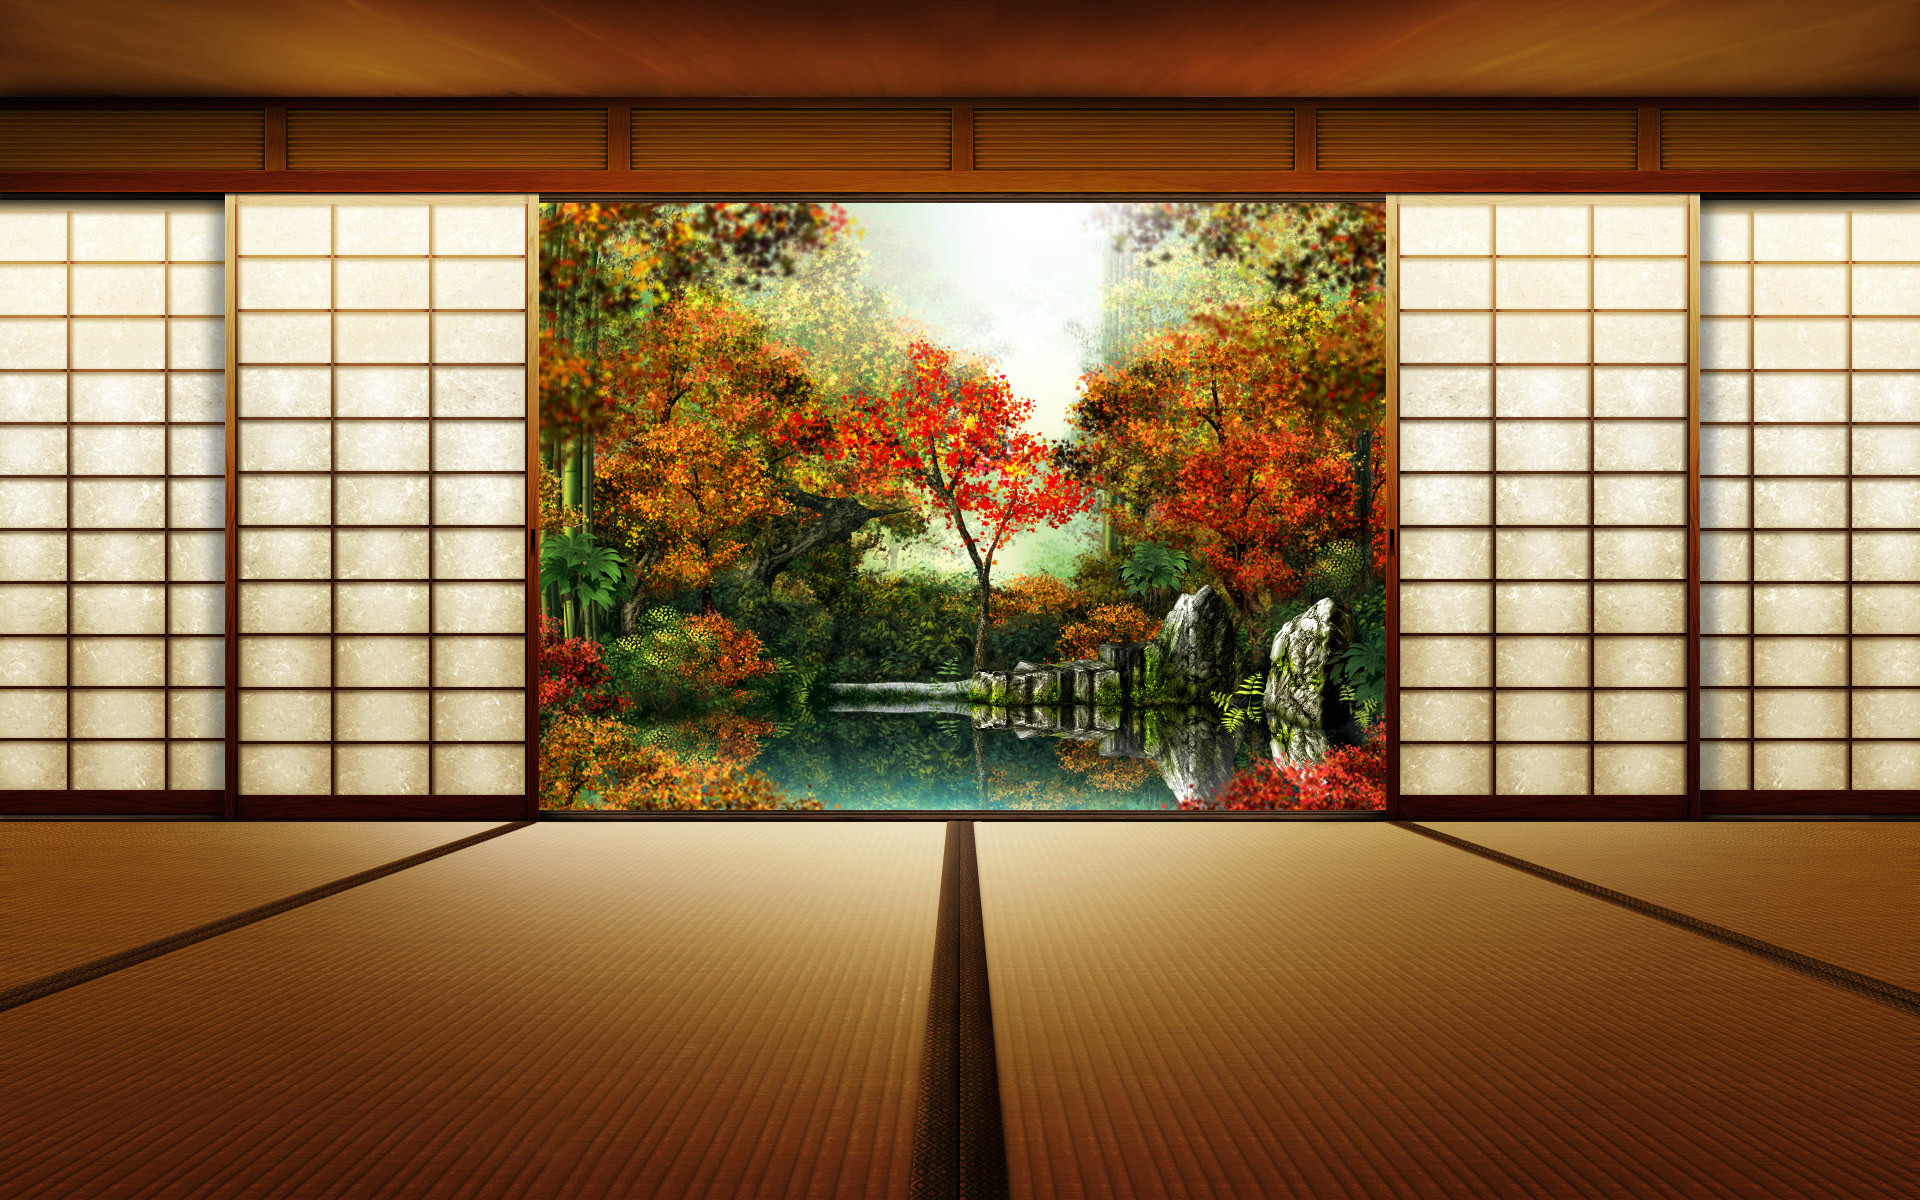 Japan Desktop Wallpaper 12427